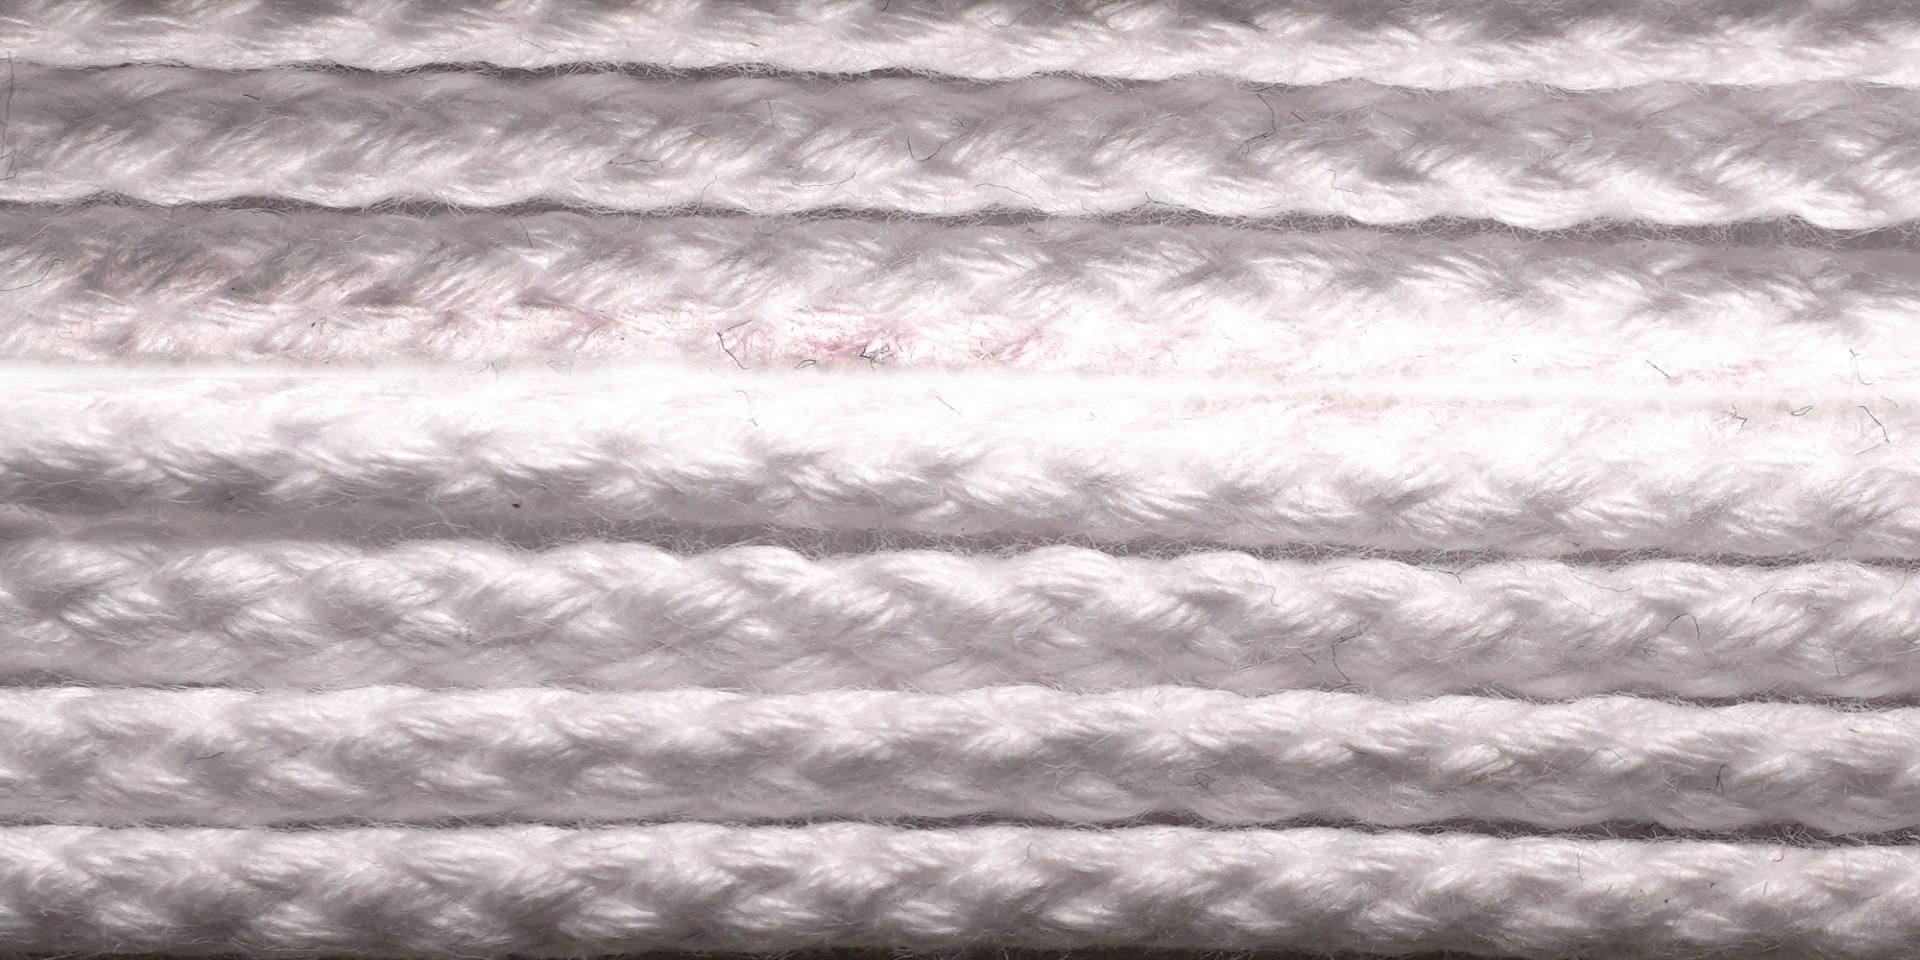 SC4 5mm white cord